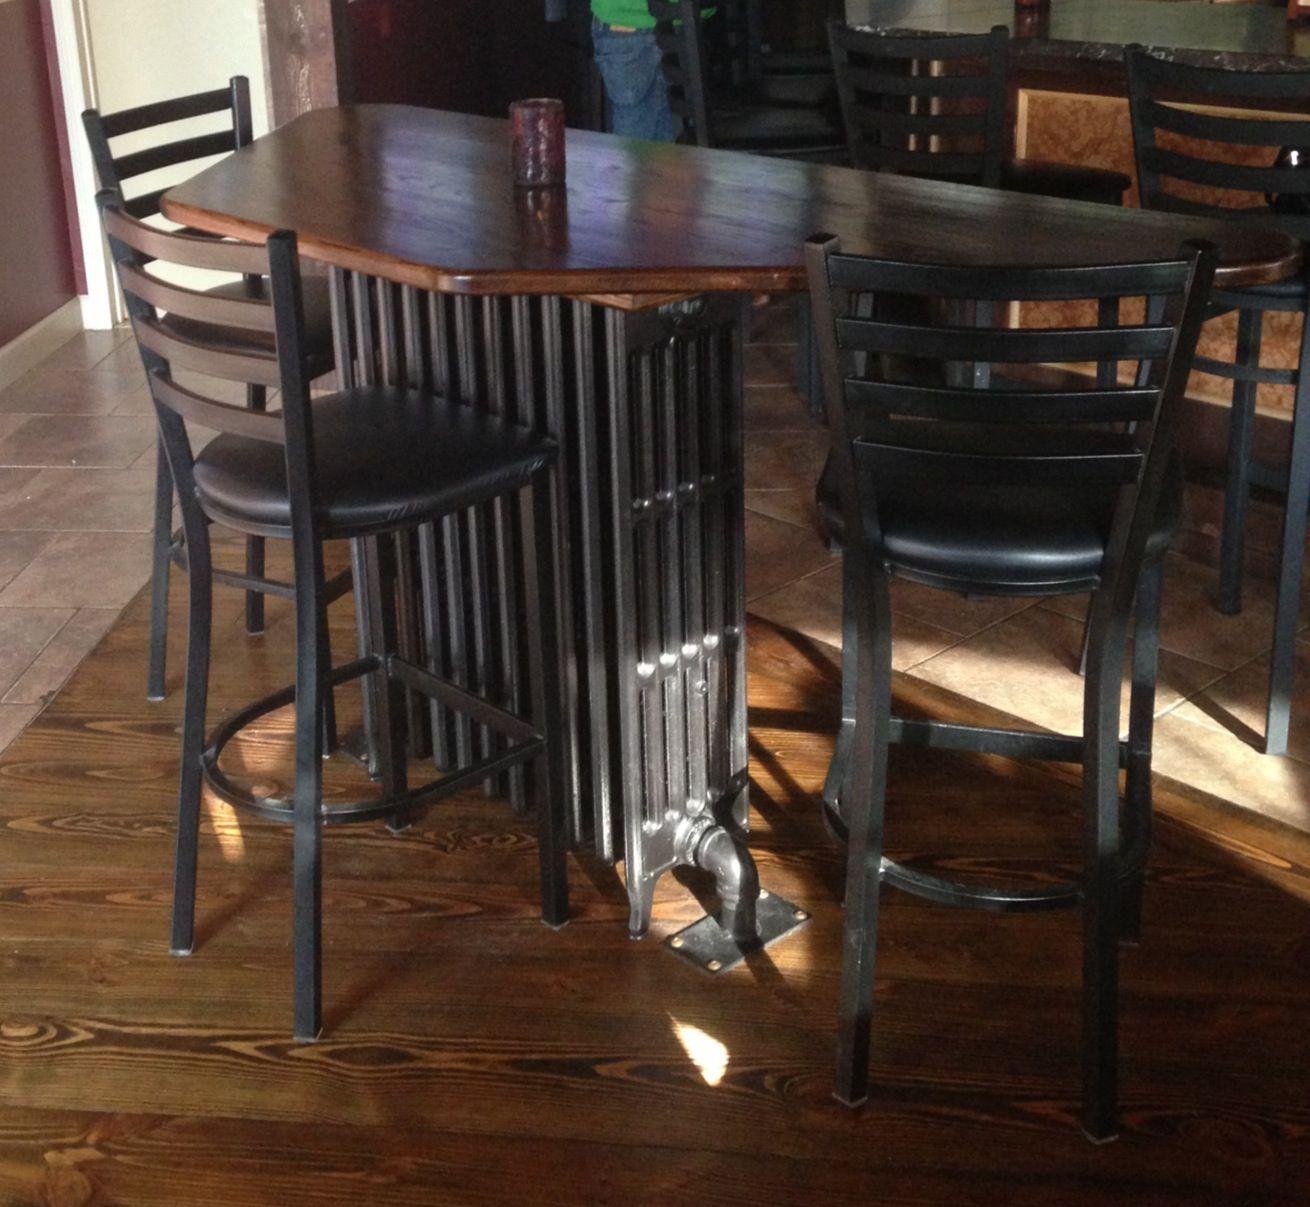 Patio Furniture Glens Falls Ny: Neat Radiator Table At The Downtown City Tavern, Glens